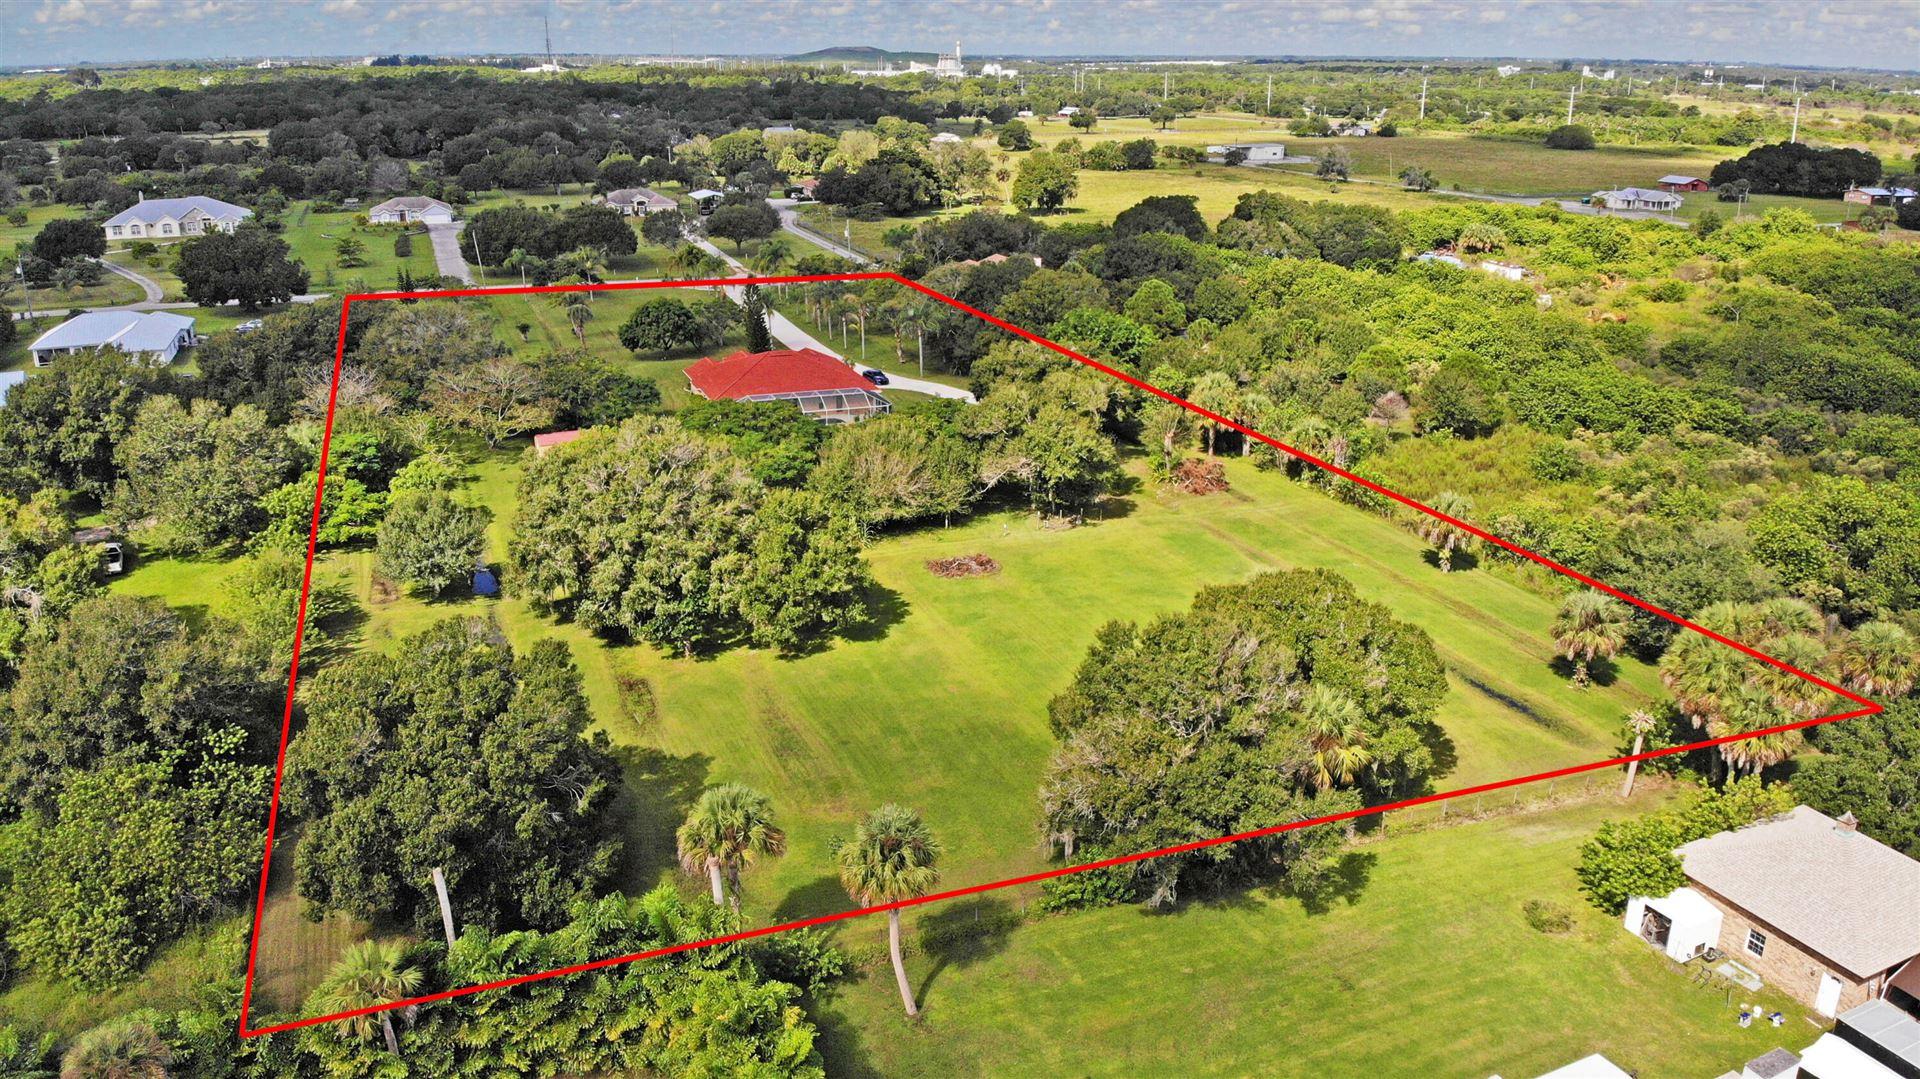 Photo of 4800 Christensen Road, Fort Pierce, FL 34981 (MLS # RX-10752515)